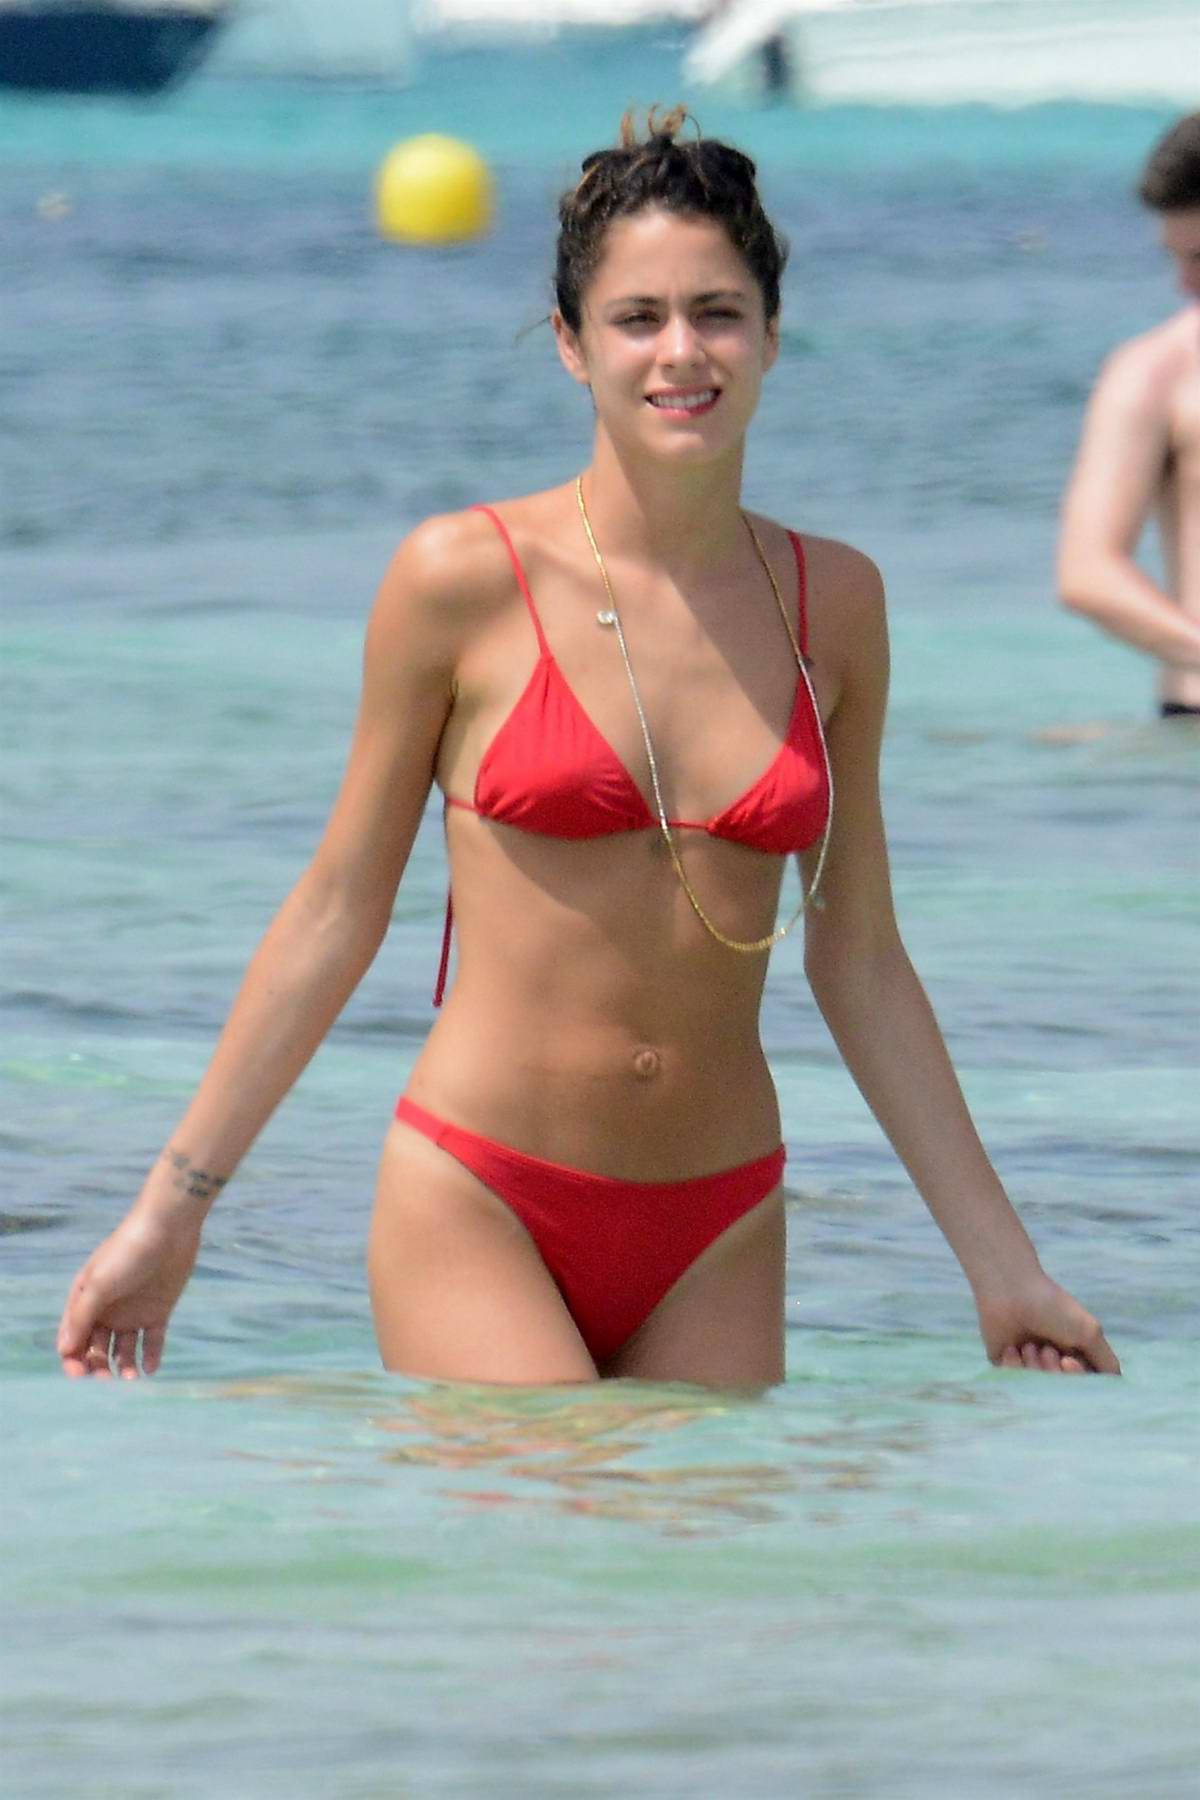 Martina Stoessel in a Red Bikini with Pepe Barroso on the Beach in Fomentera, Spain